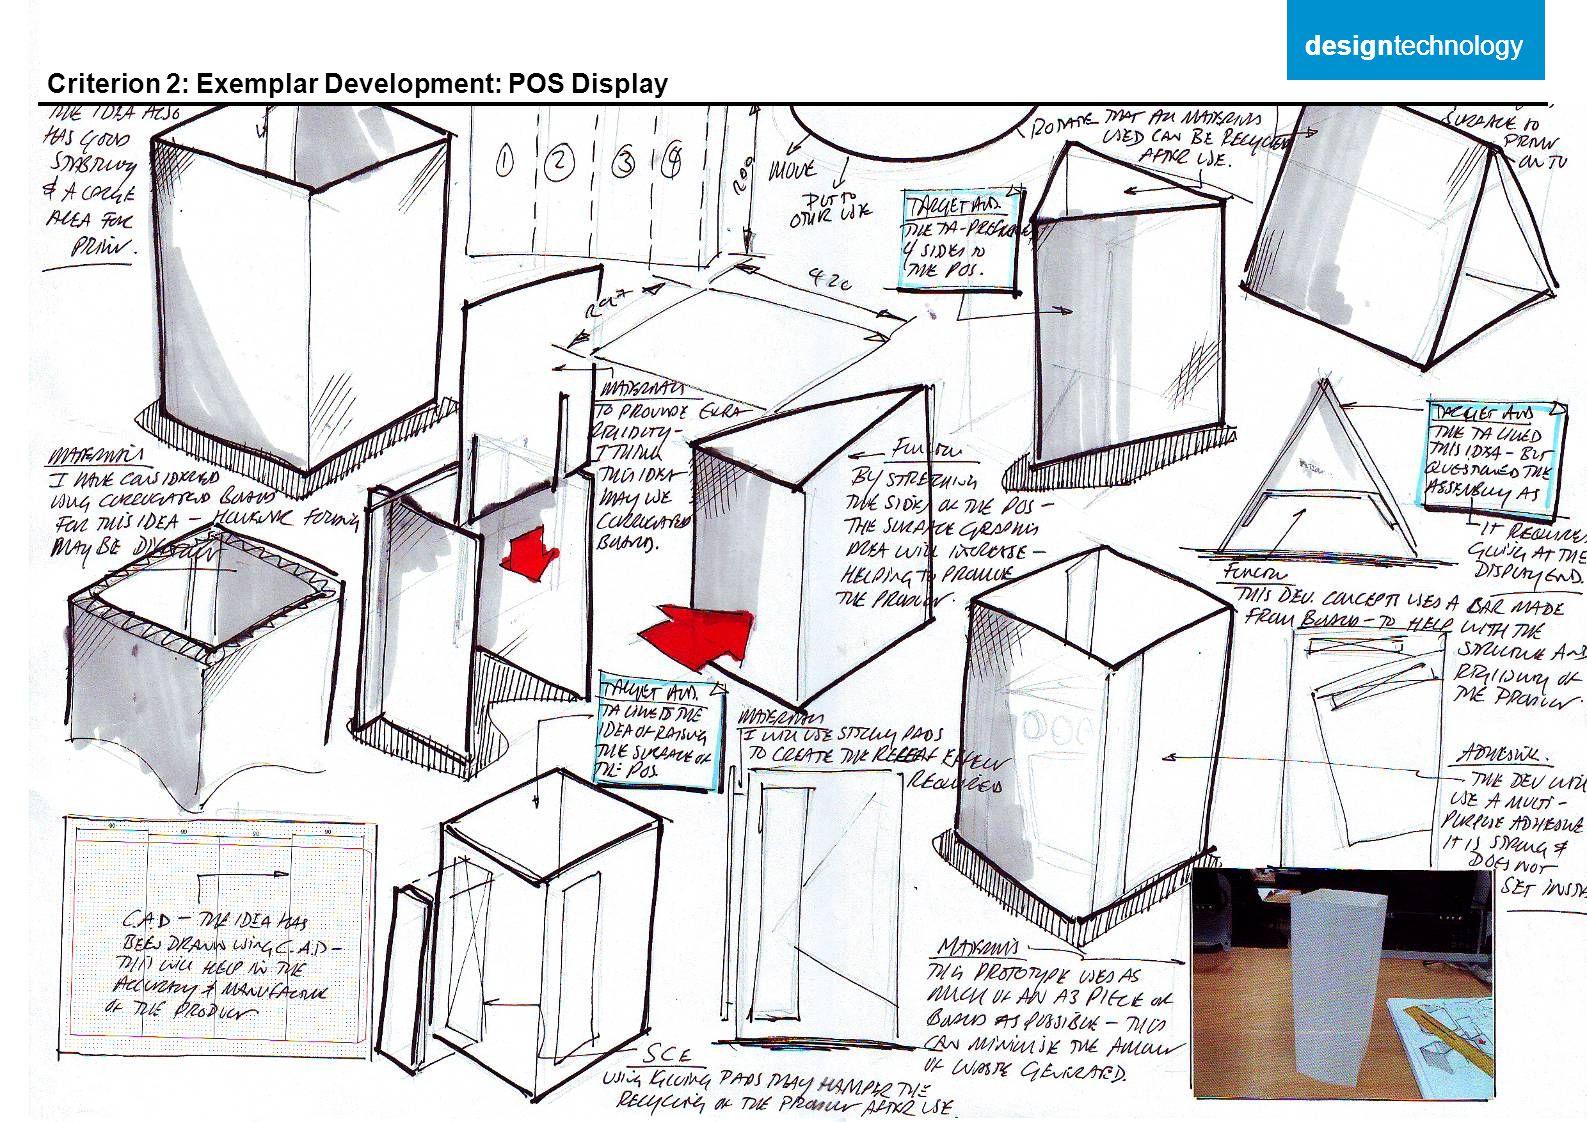 Criterion 2: Exemplar Development: POS Display designtechnology